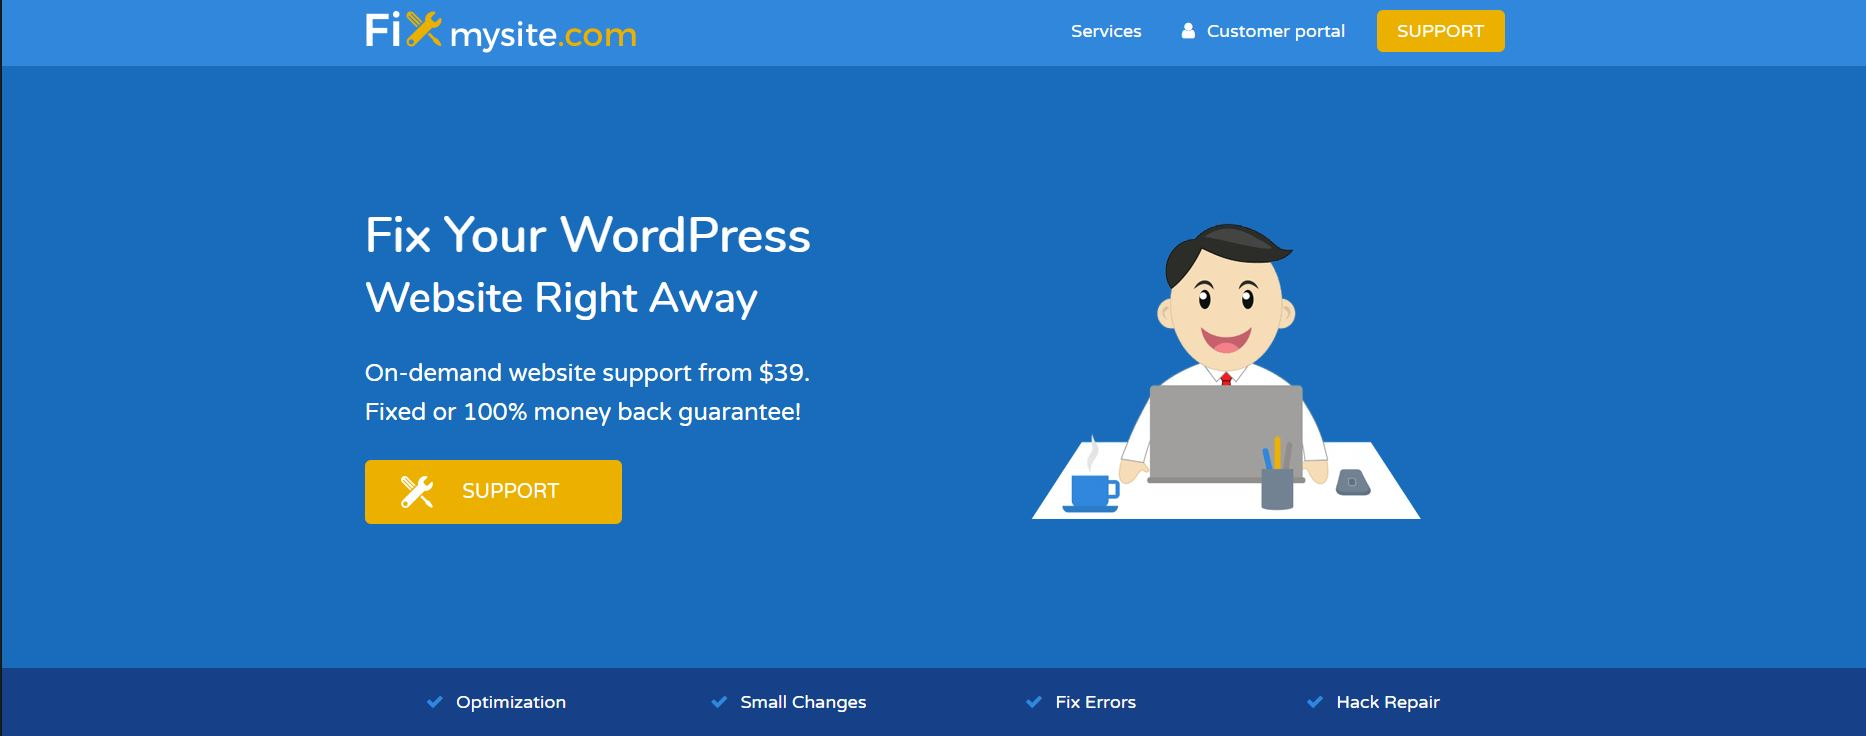 17 Best WordPress Support Services 2019 | StylemixThemes